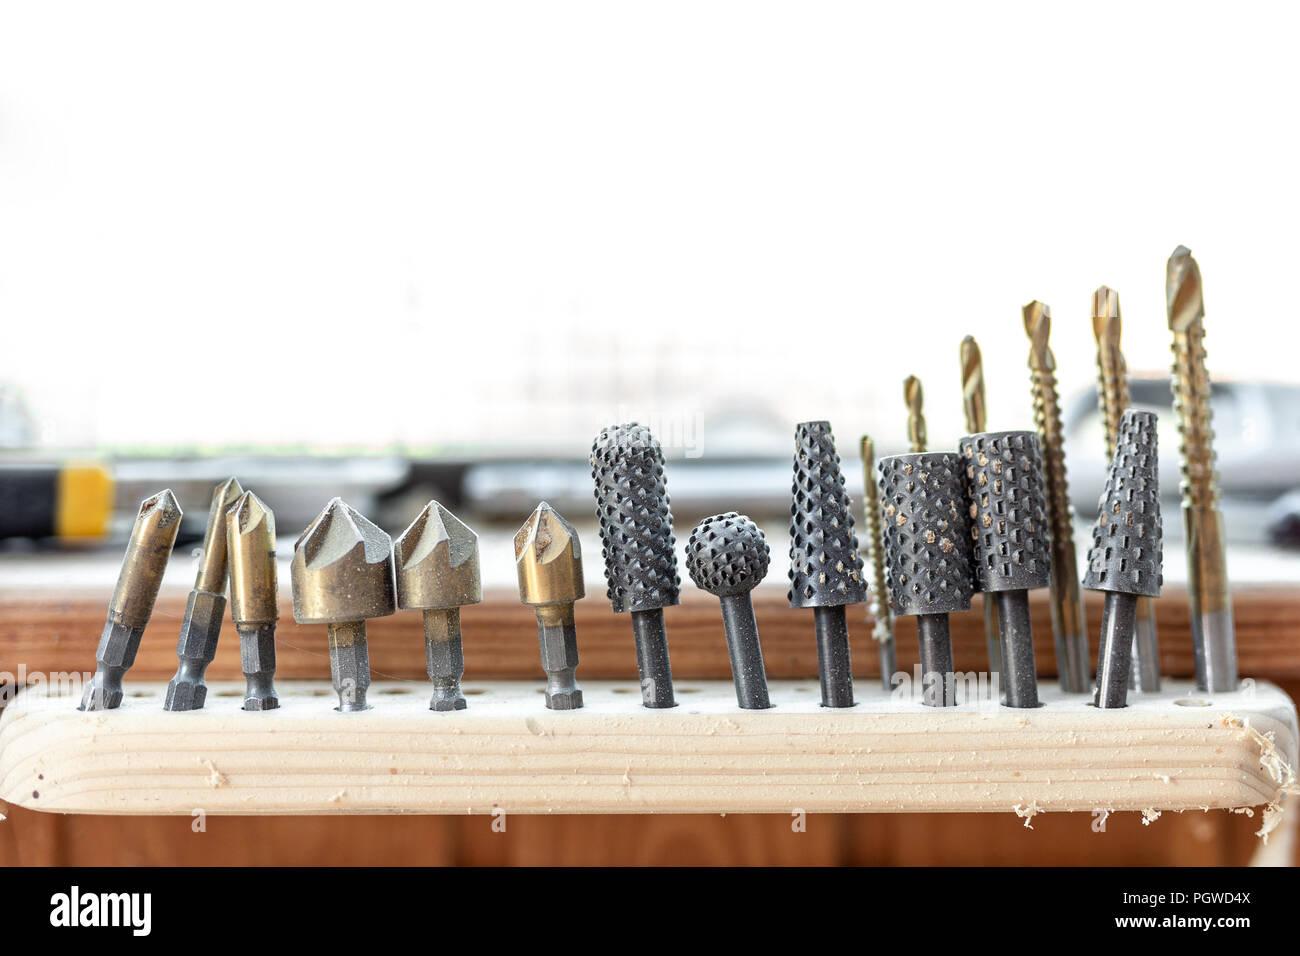 Close-up woodwork tool set. Rasp-file burr countersink kit. Carpentry woodworking workshop concept. - Stock Image